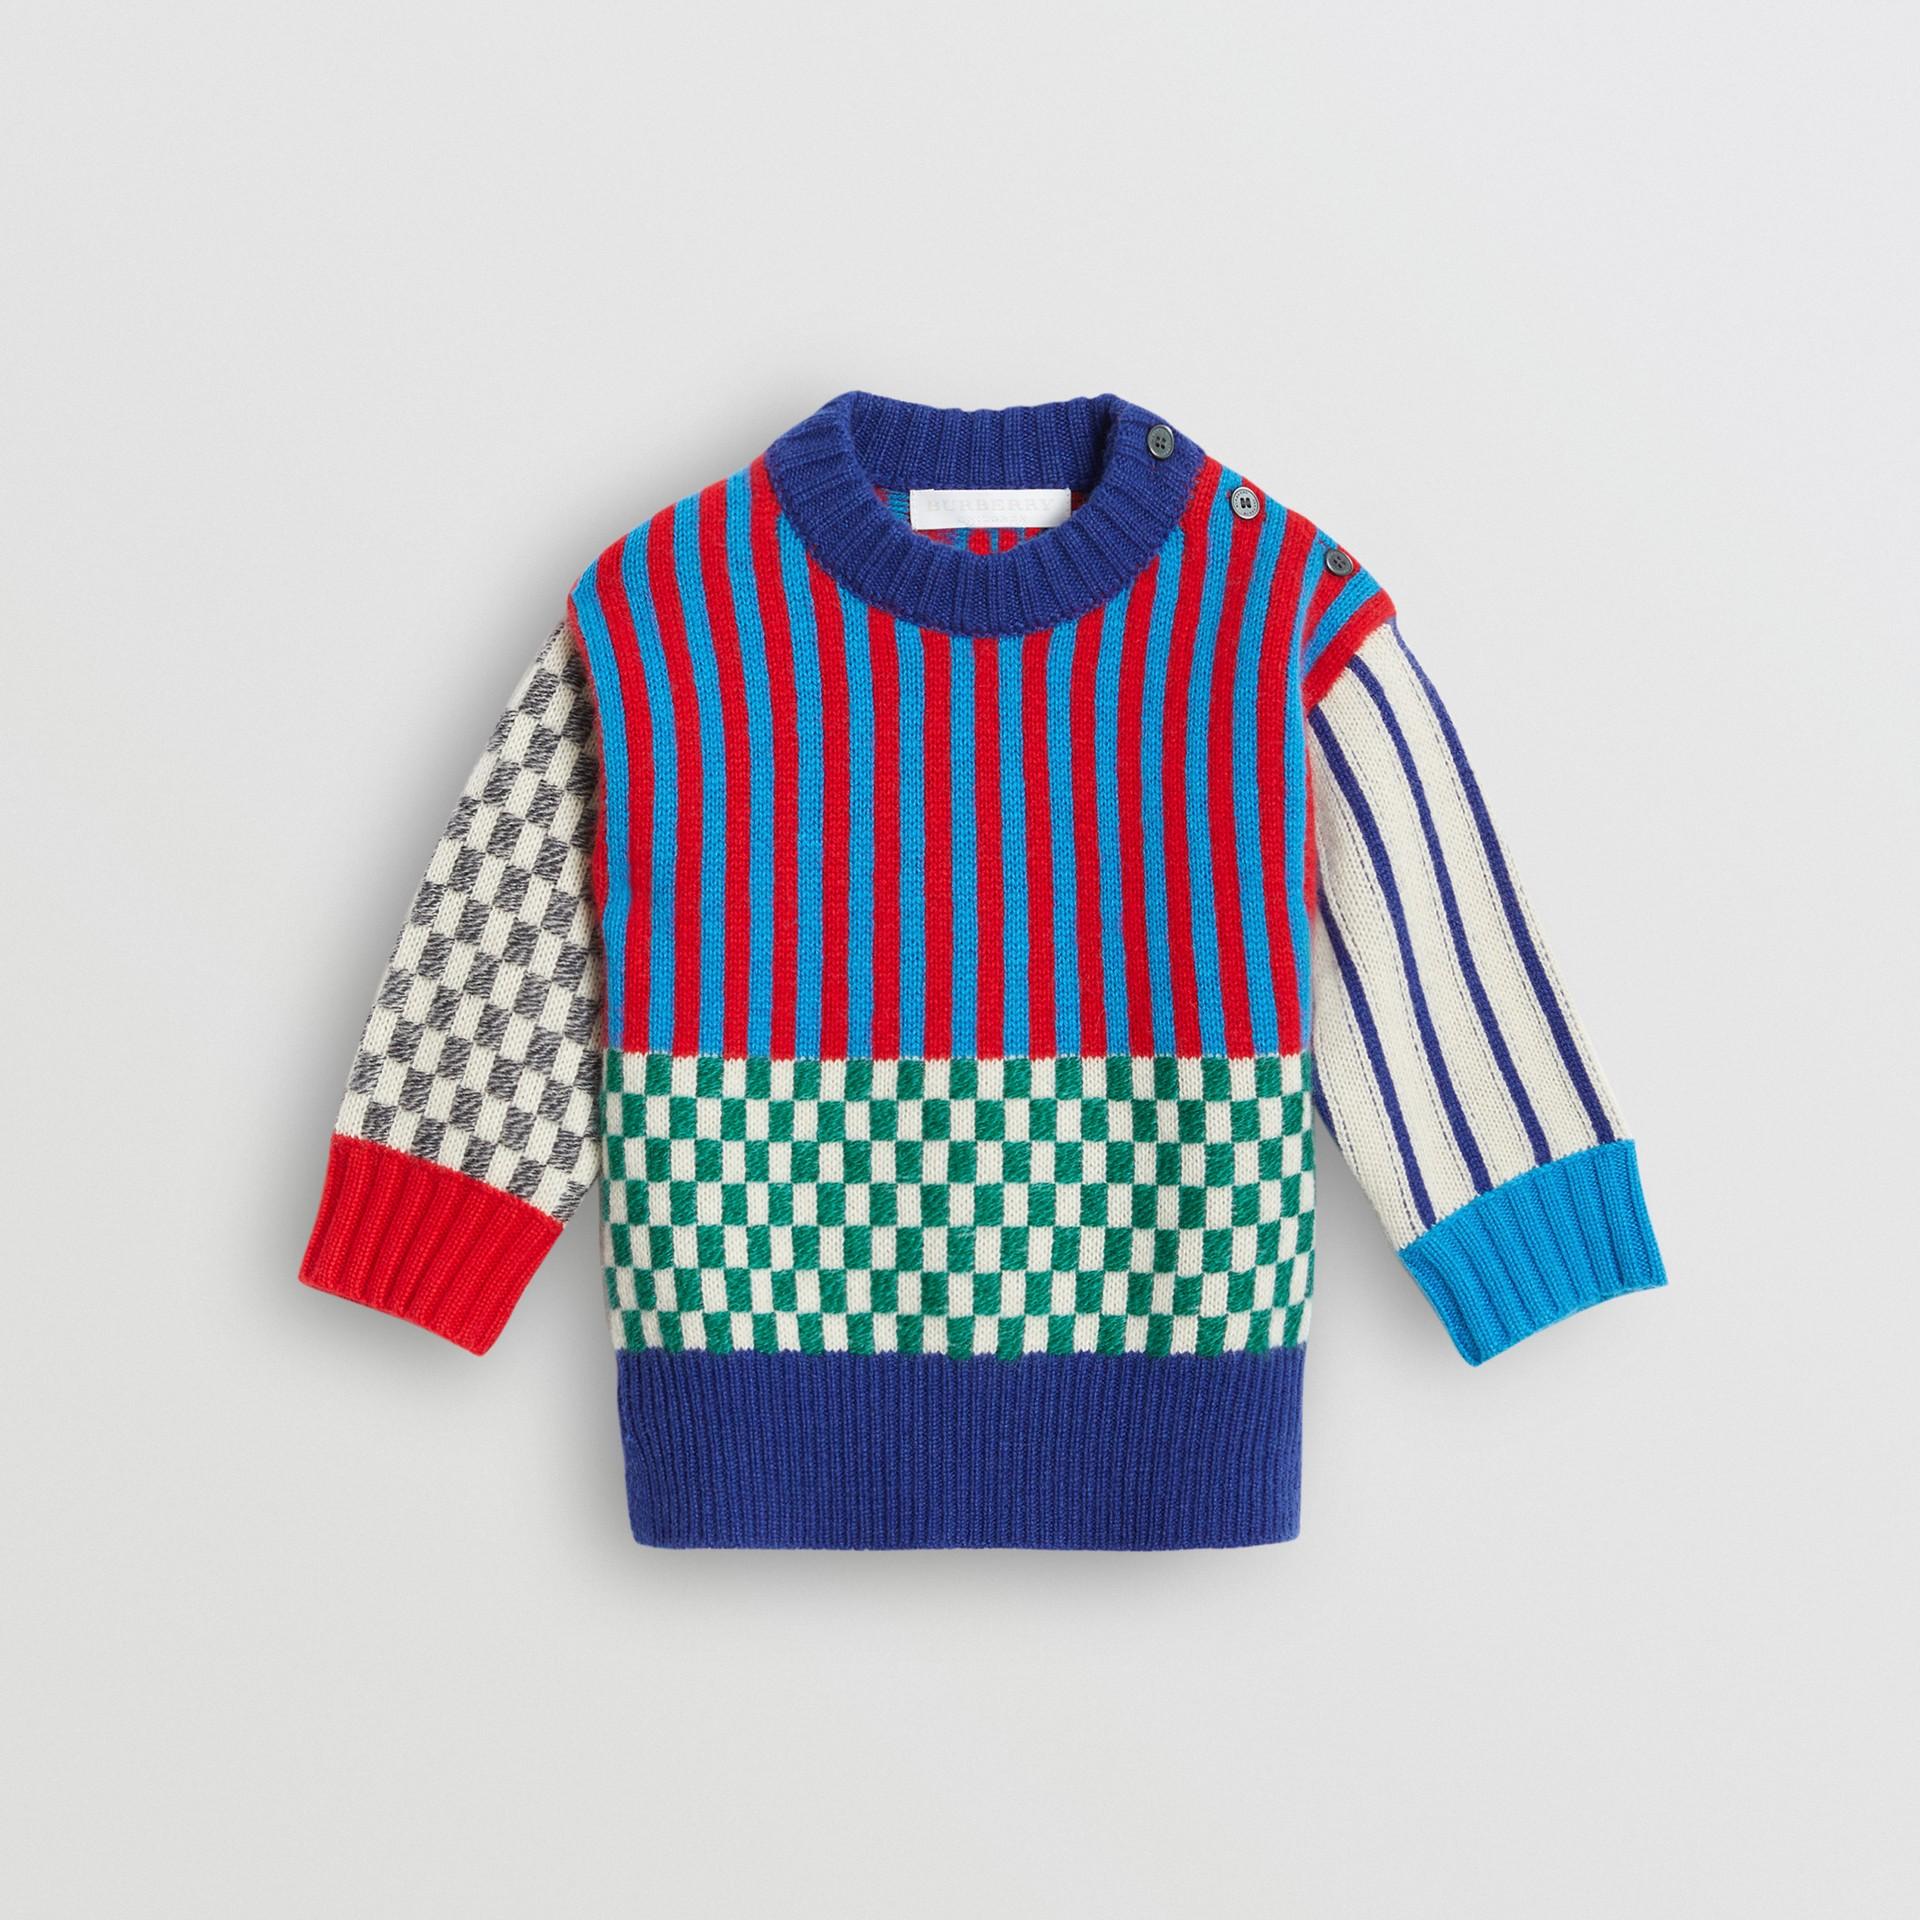 Graphic Cashmere Jacquard Sweater in Multicolour - Children | Burberry United Kingdom - gallery image 0